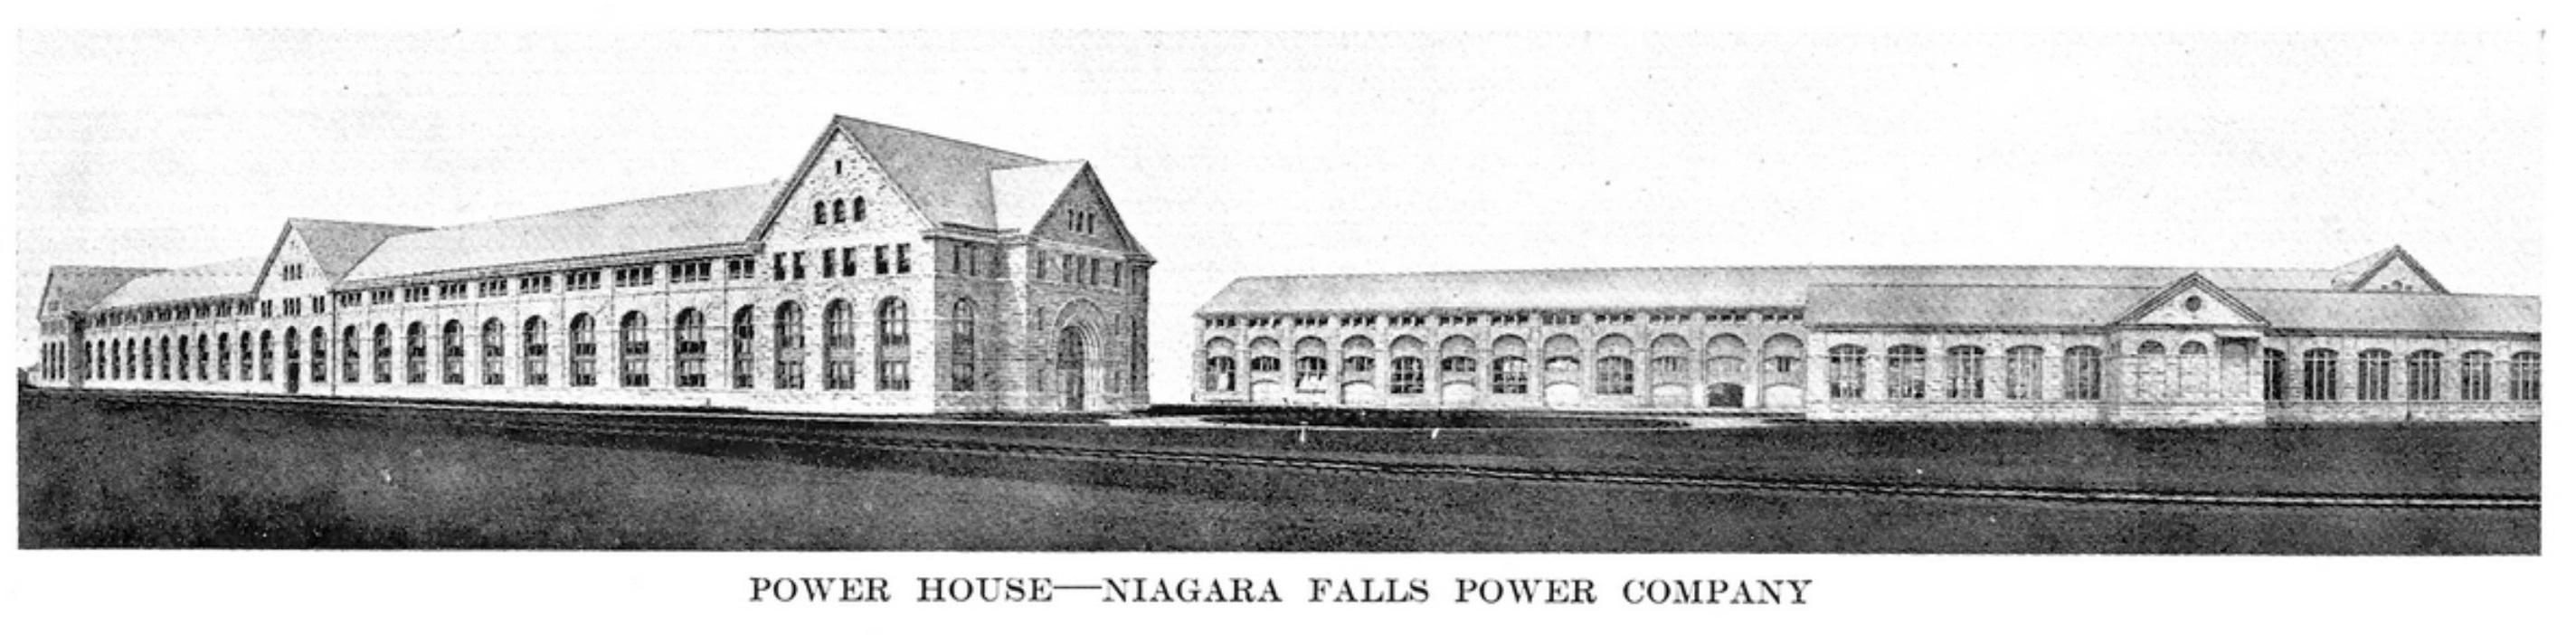 Powerhouse - Niagara Falls Power Co.. illustration (Greater Buffalo NY Undustrial Commercial, 1914).jpg